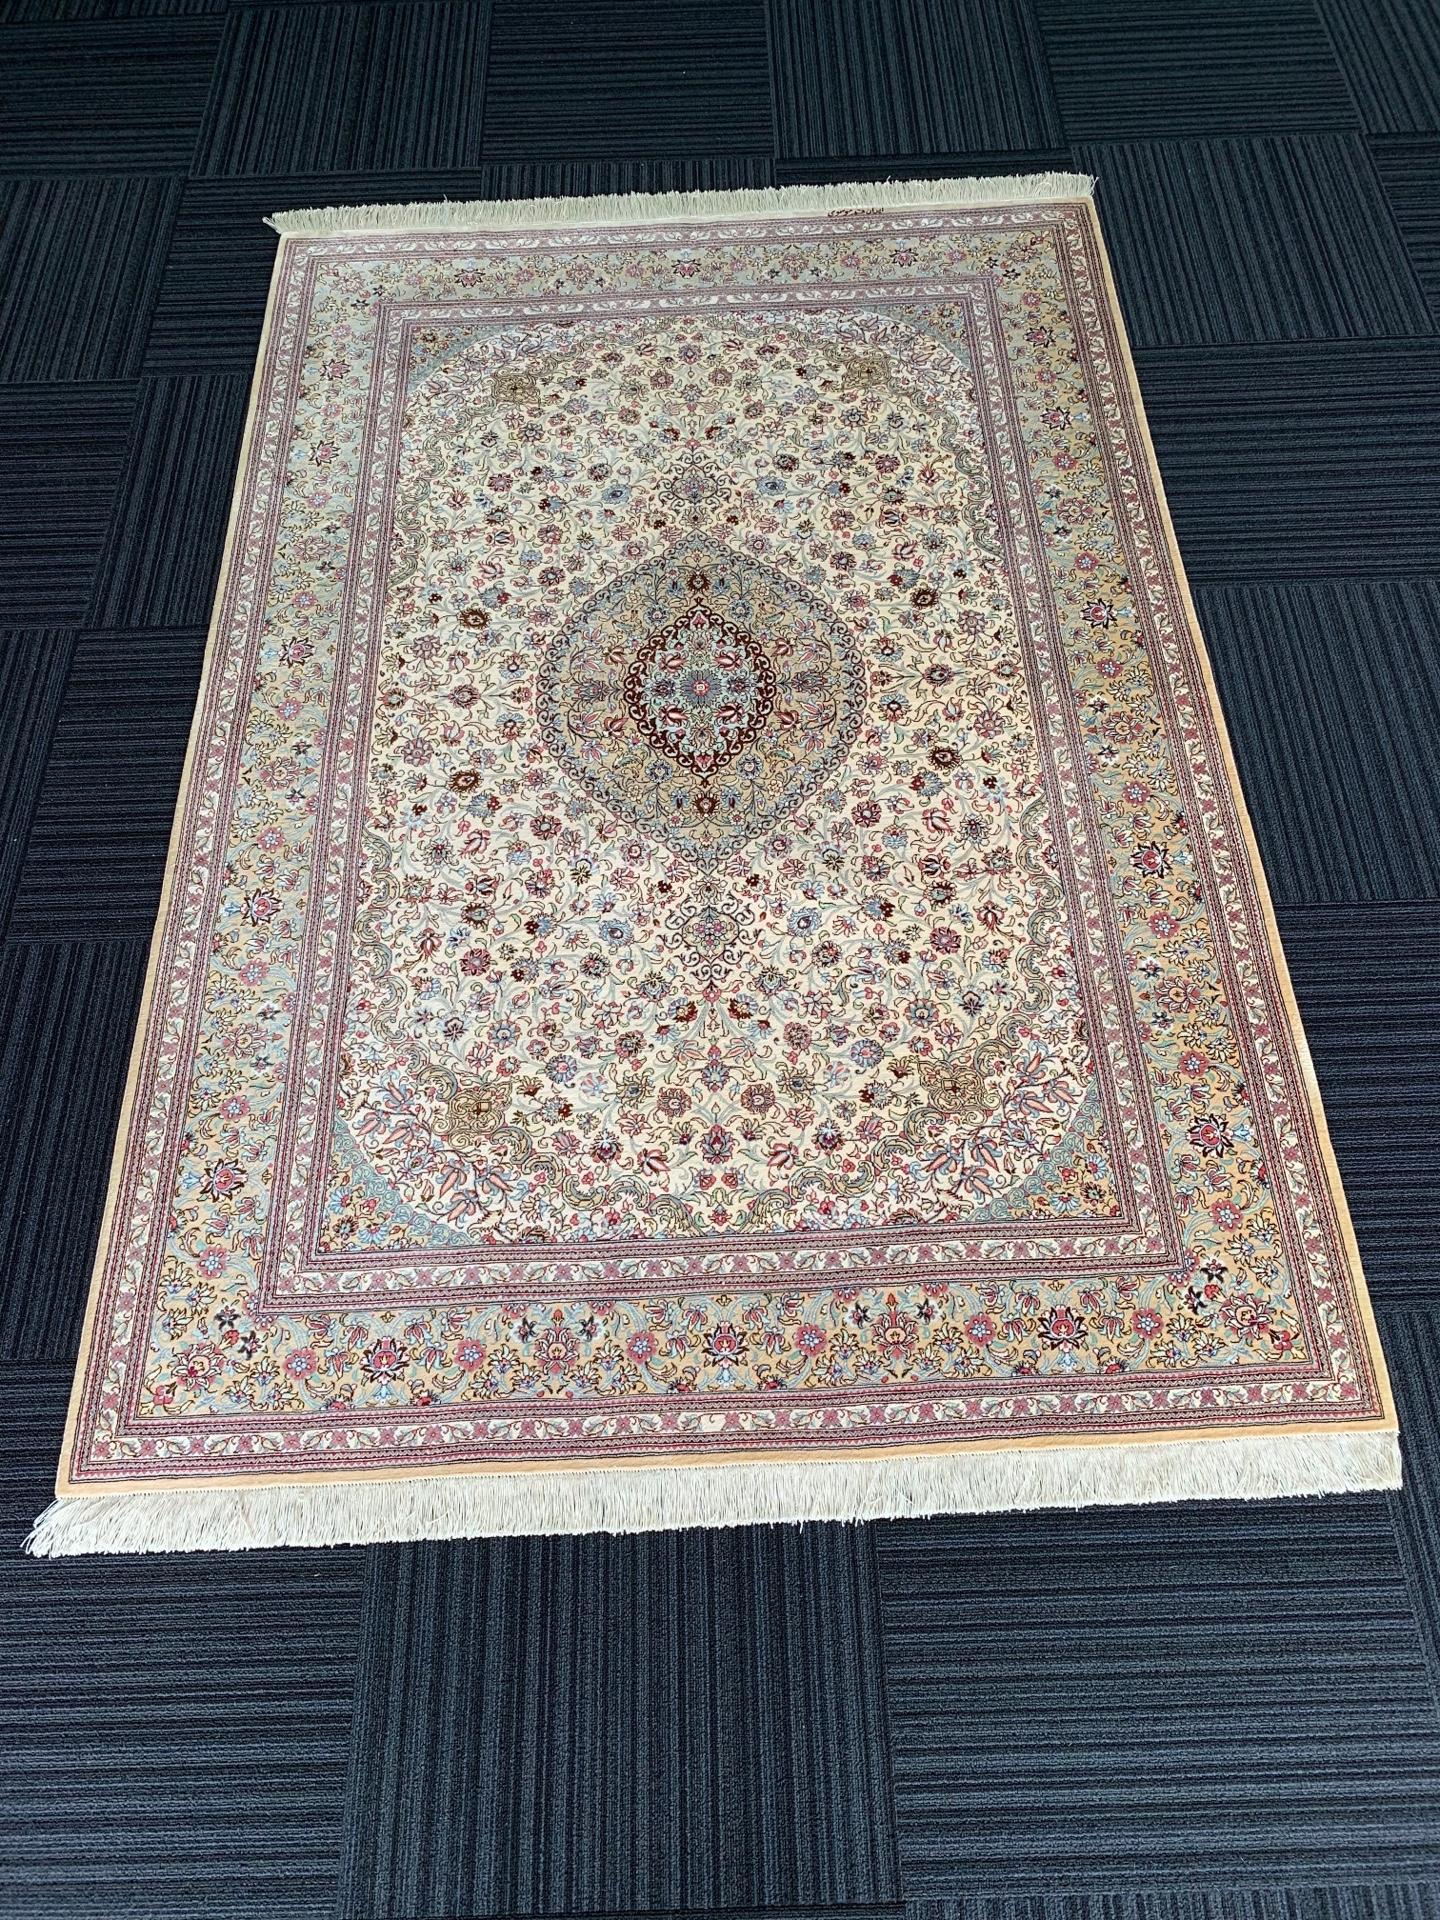 QM11034 クム 手織り ペルシャ絨毯 135×199